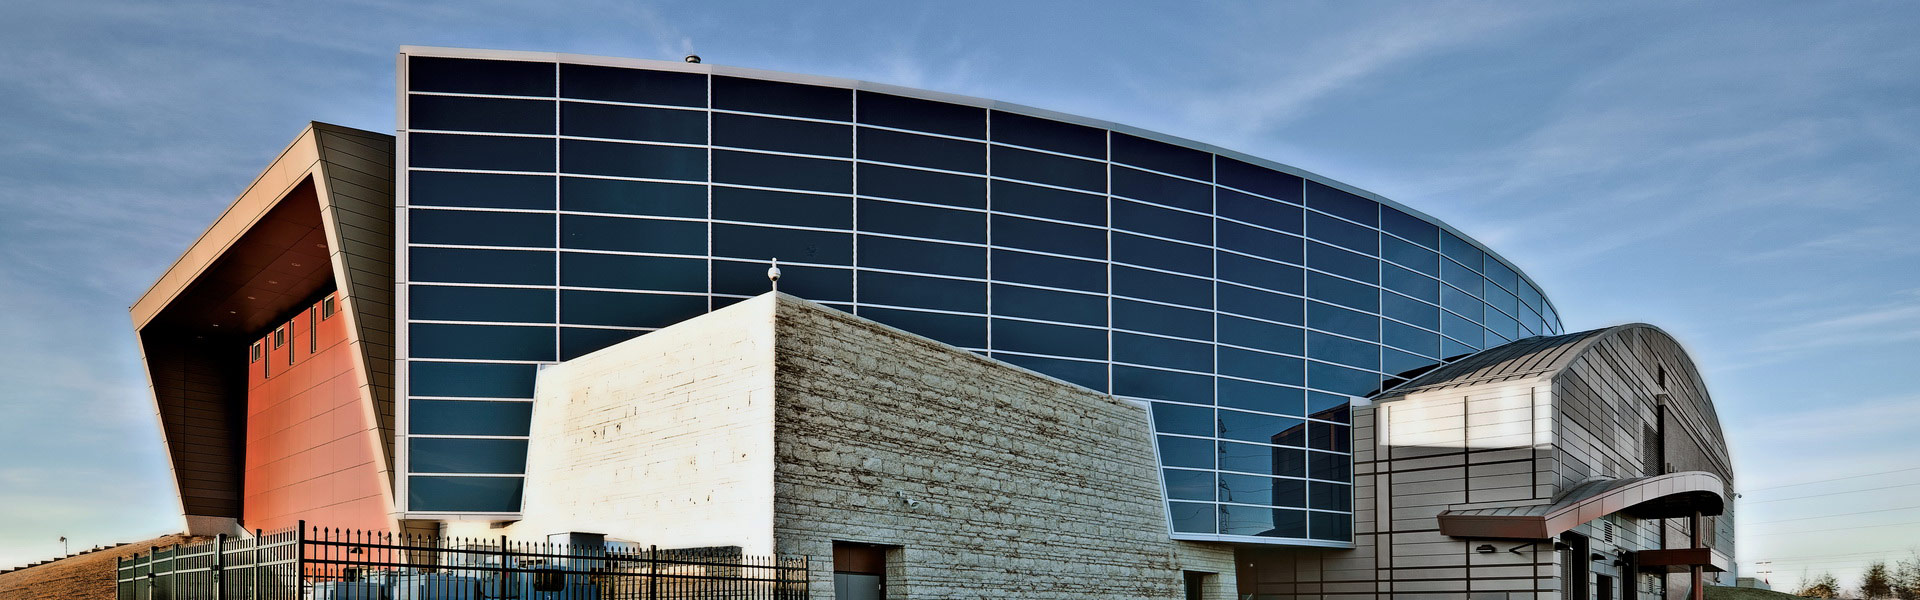 Solar Photovoltaic System Installation